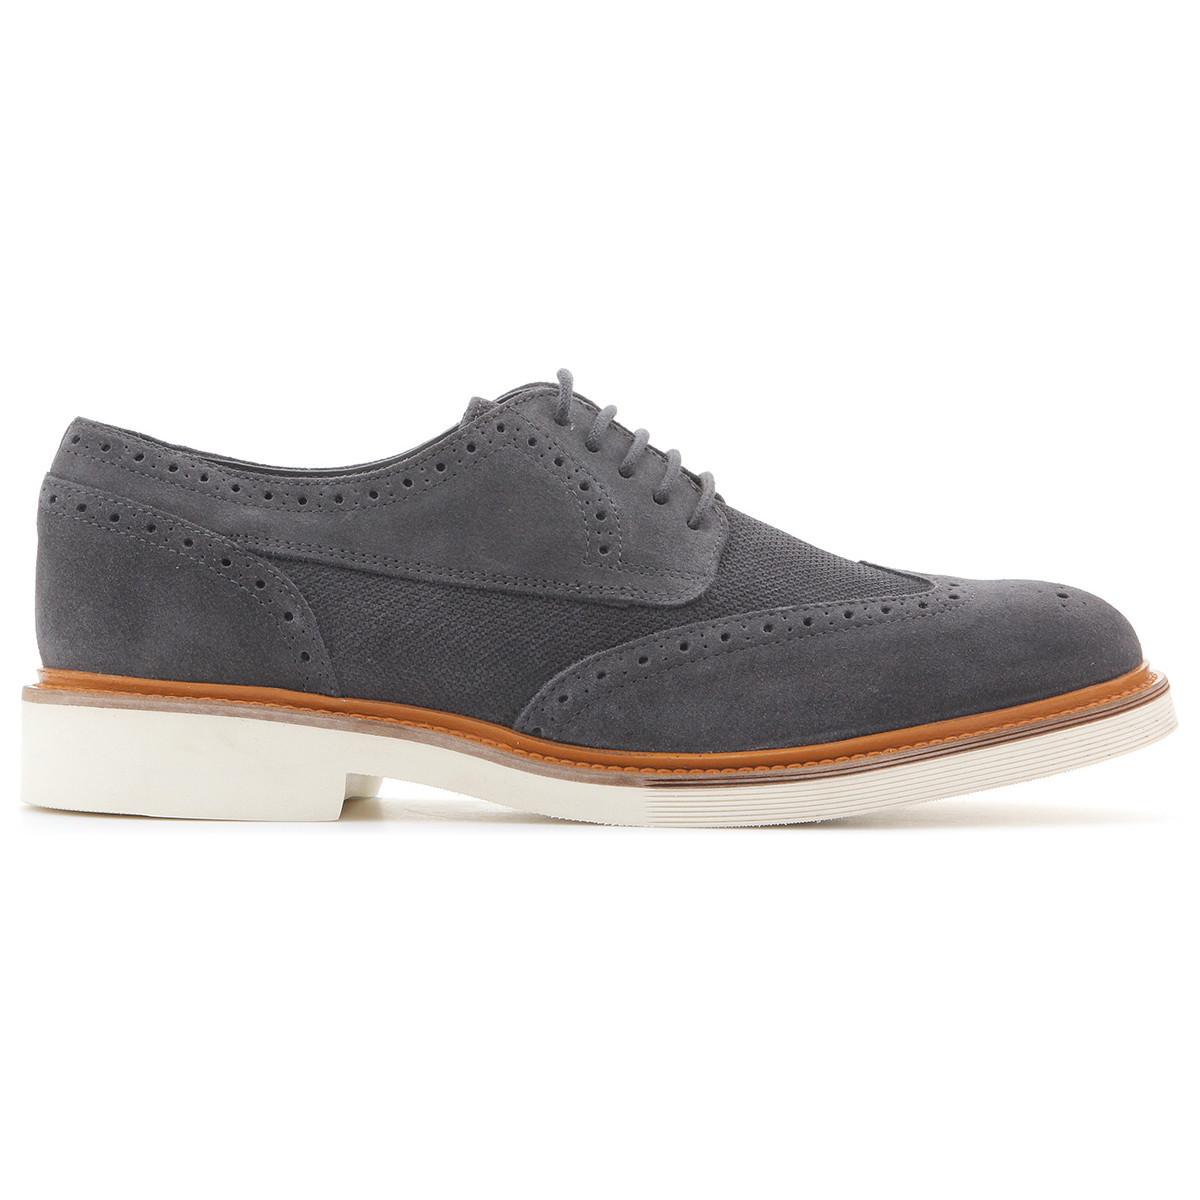 DC Shoes DC Damocle Print Suede U820SB 0BS22 C9002 szary - Schuhe Derby-Schuhe Herren 113,84 €